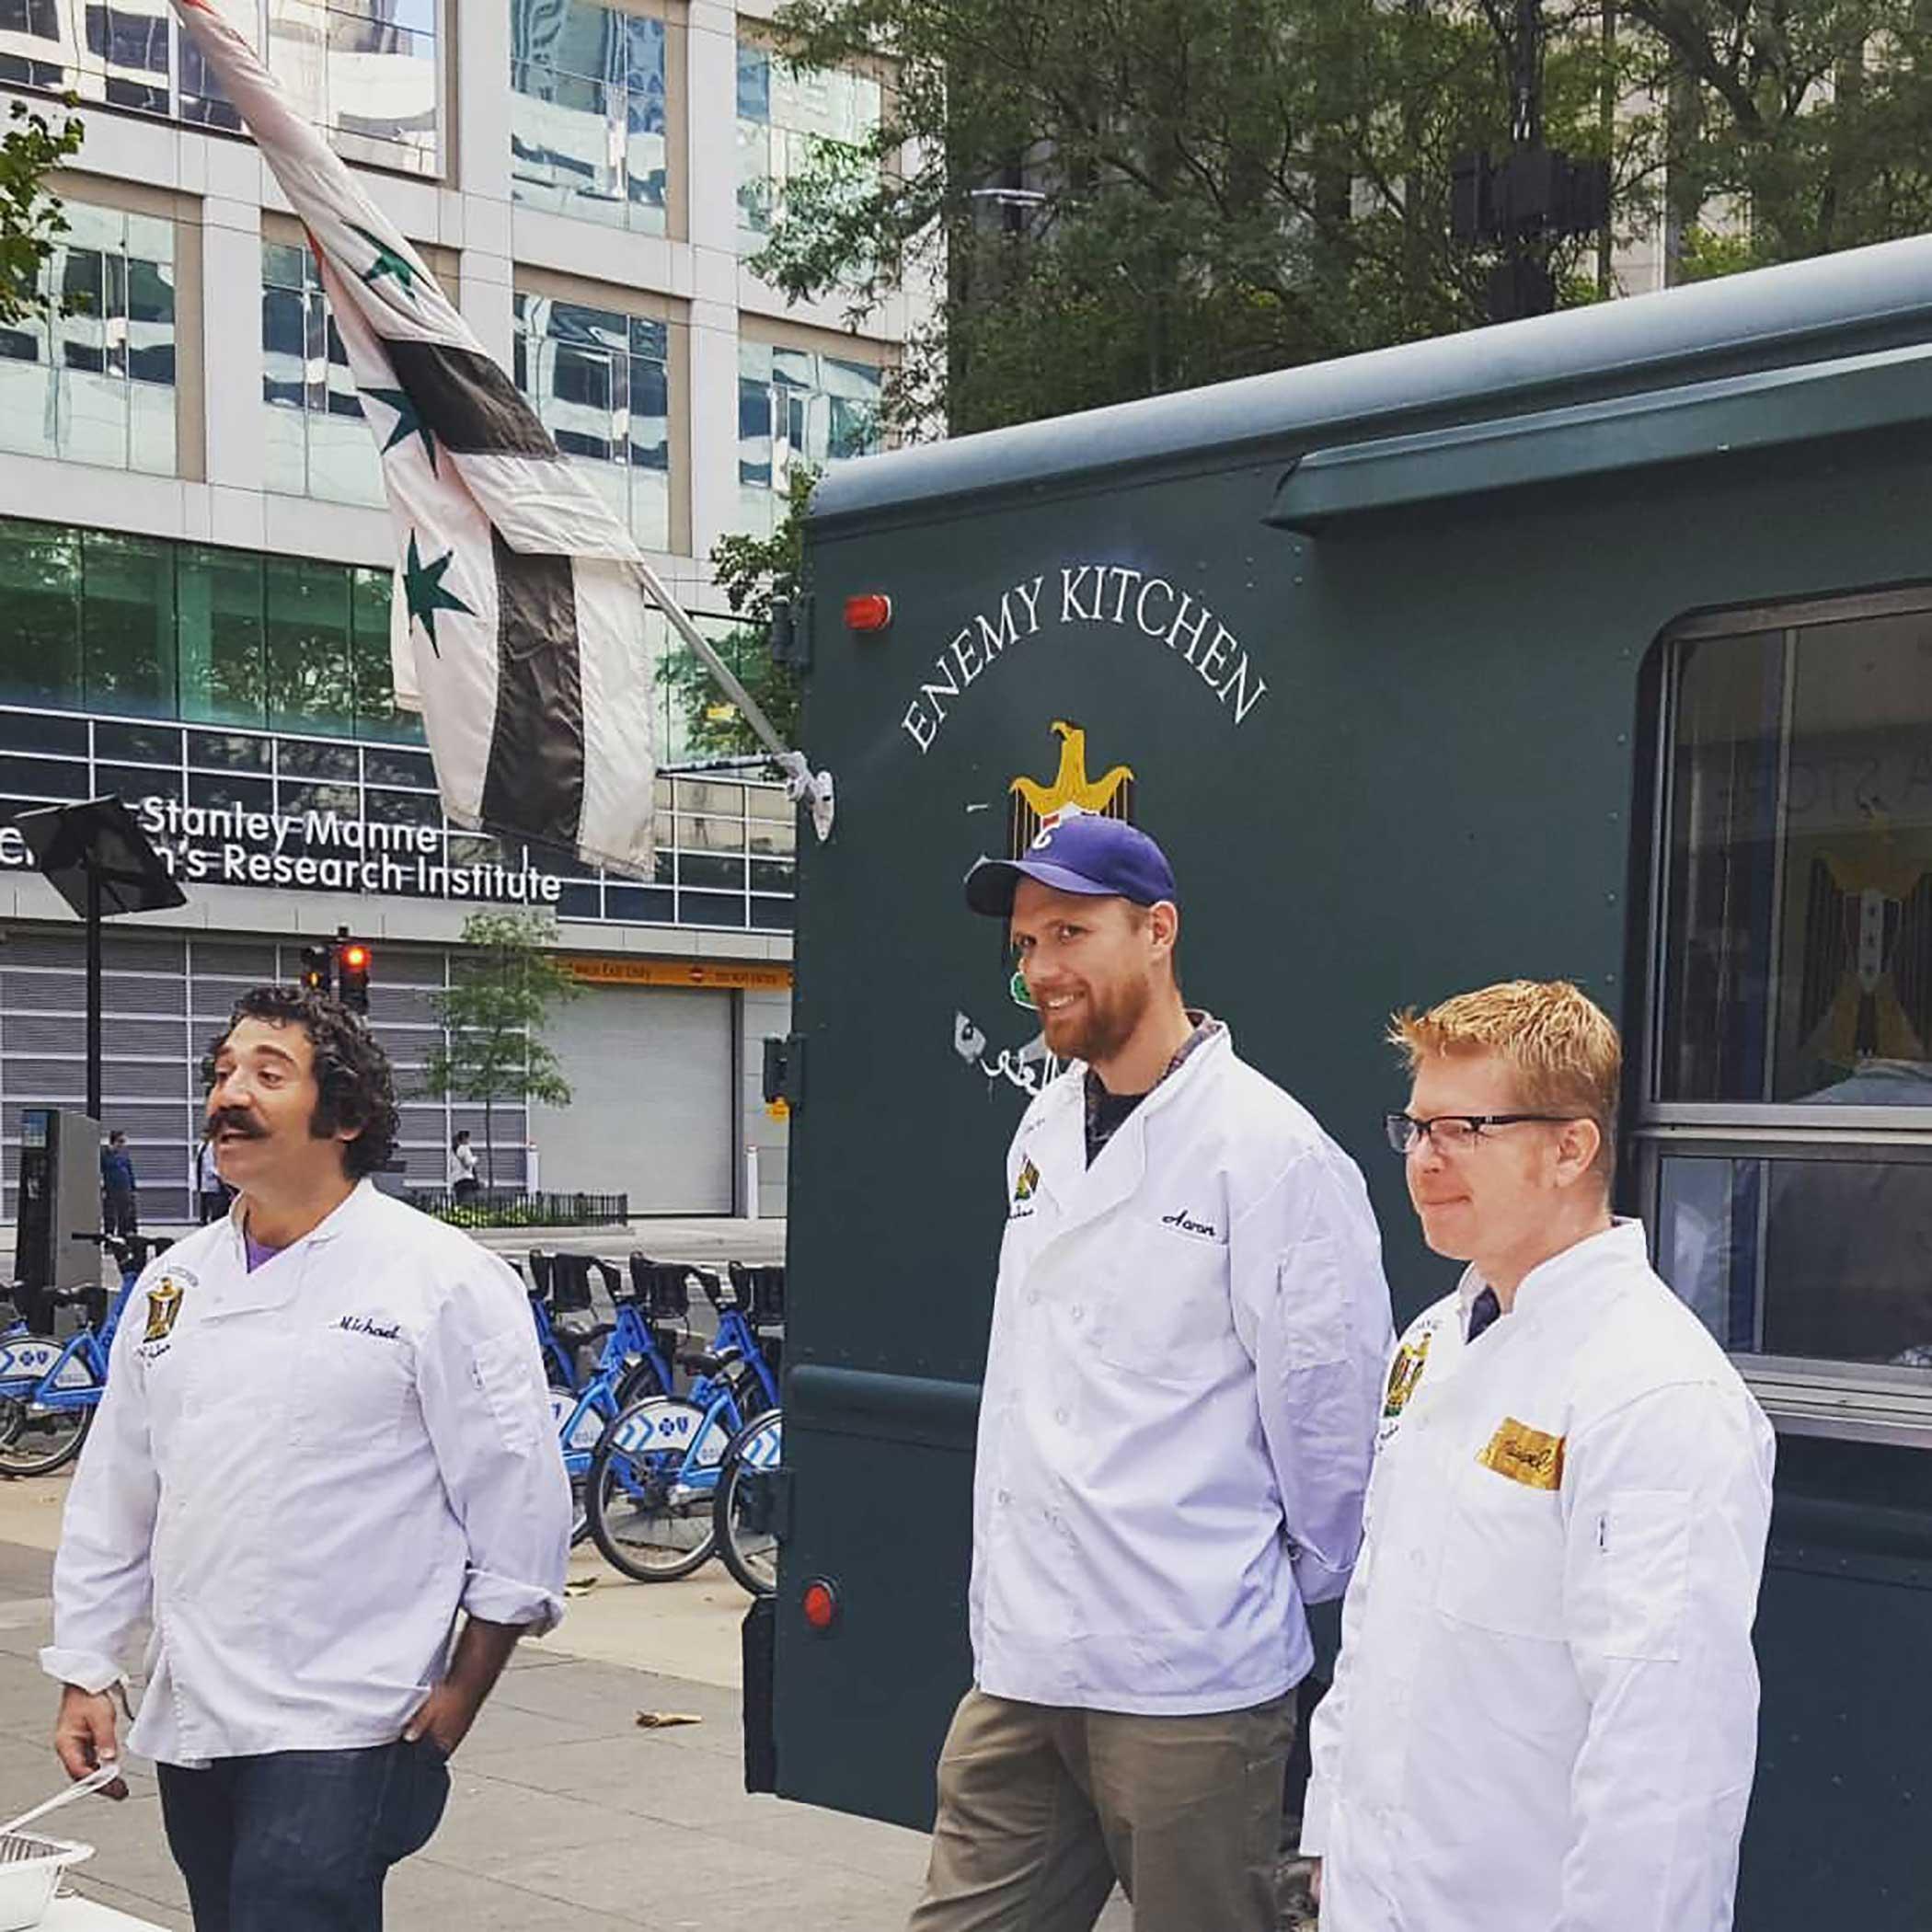 Michael Rakowitz,  Enemy Kitchen , MCA Chicago, 2017 Photo: Charity White, courtesy of the artist